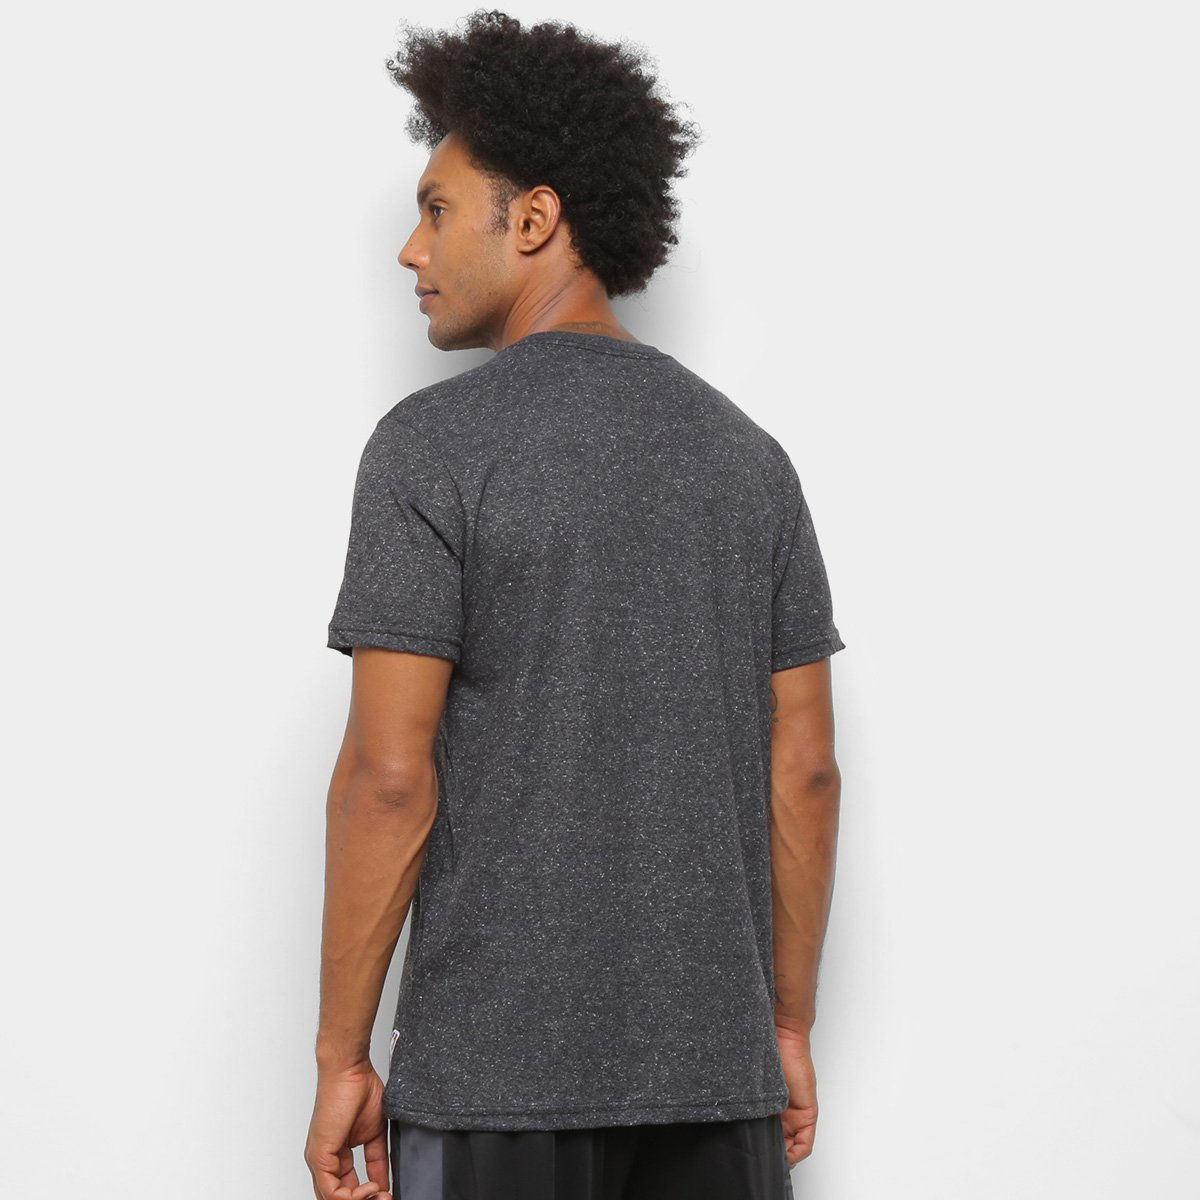 Camiseta NBA Brooklyn Nets Especial Masculina - Preto - Loja NBA